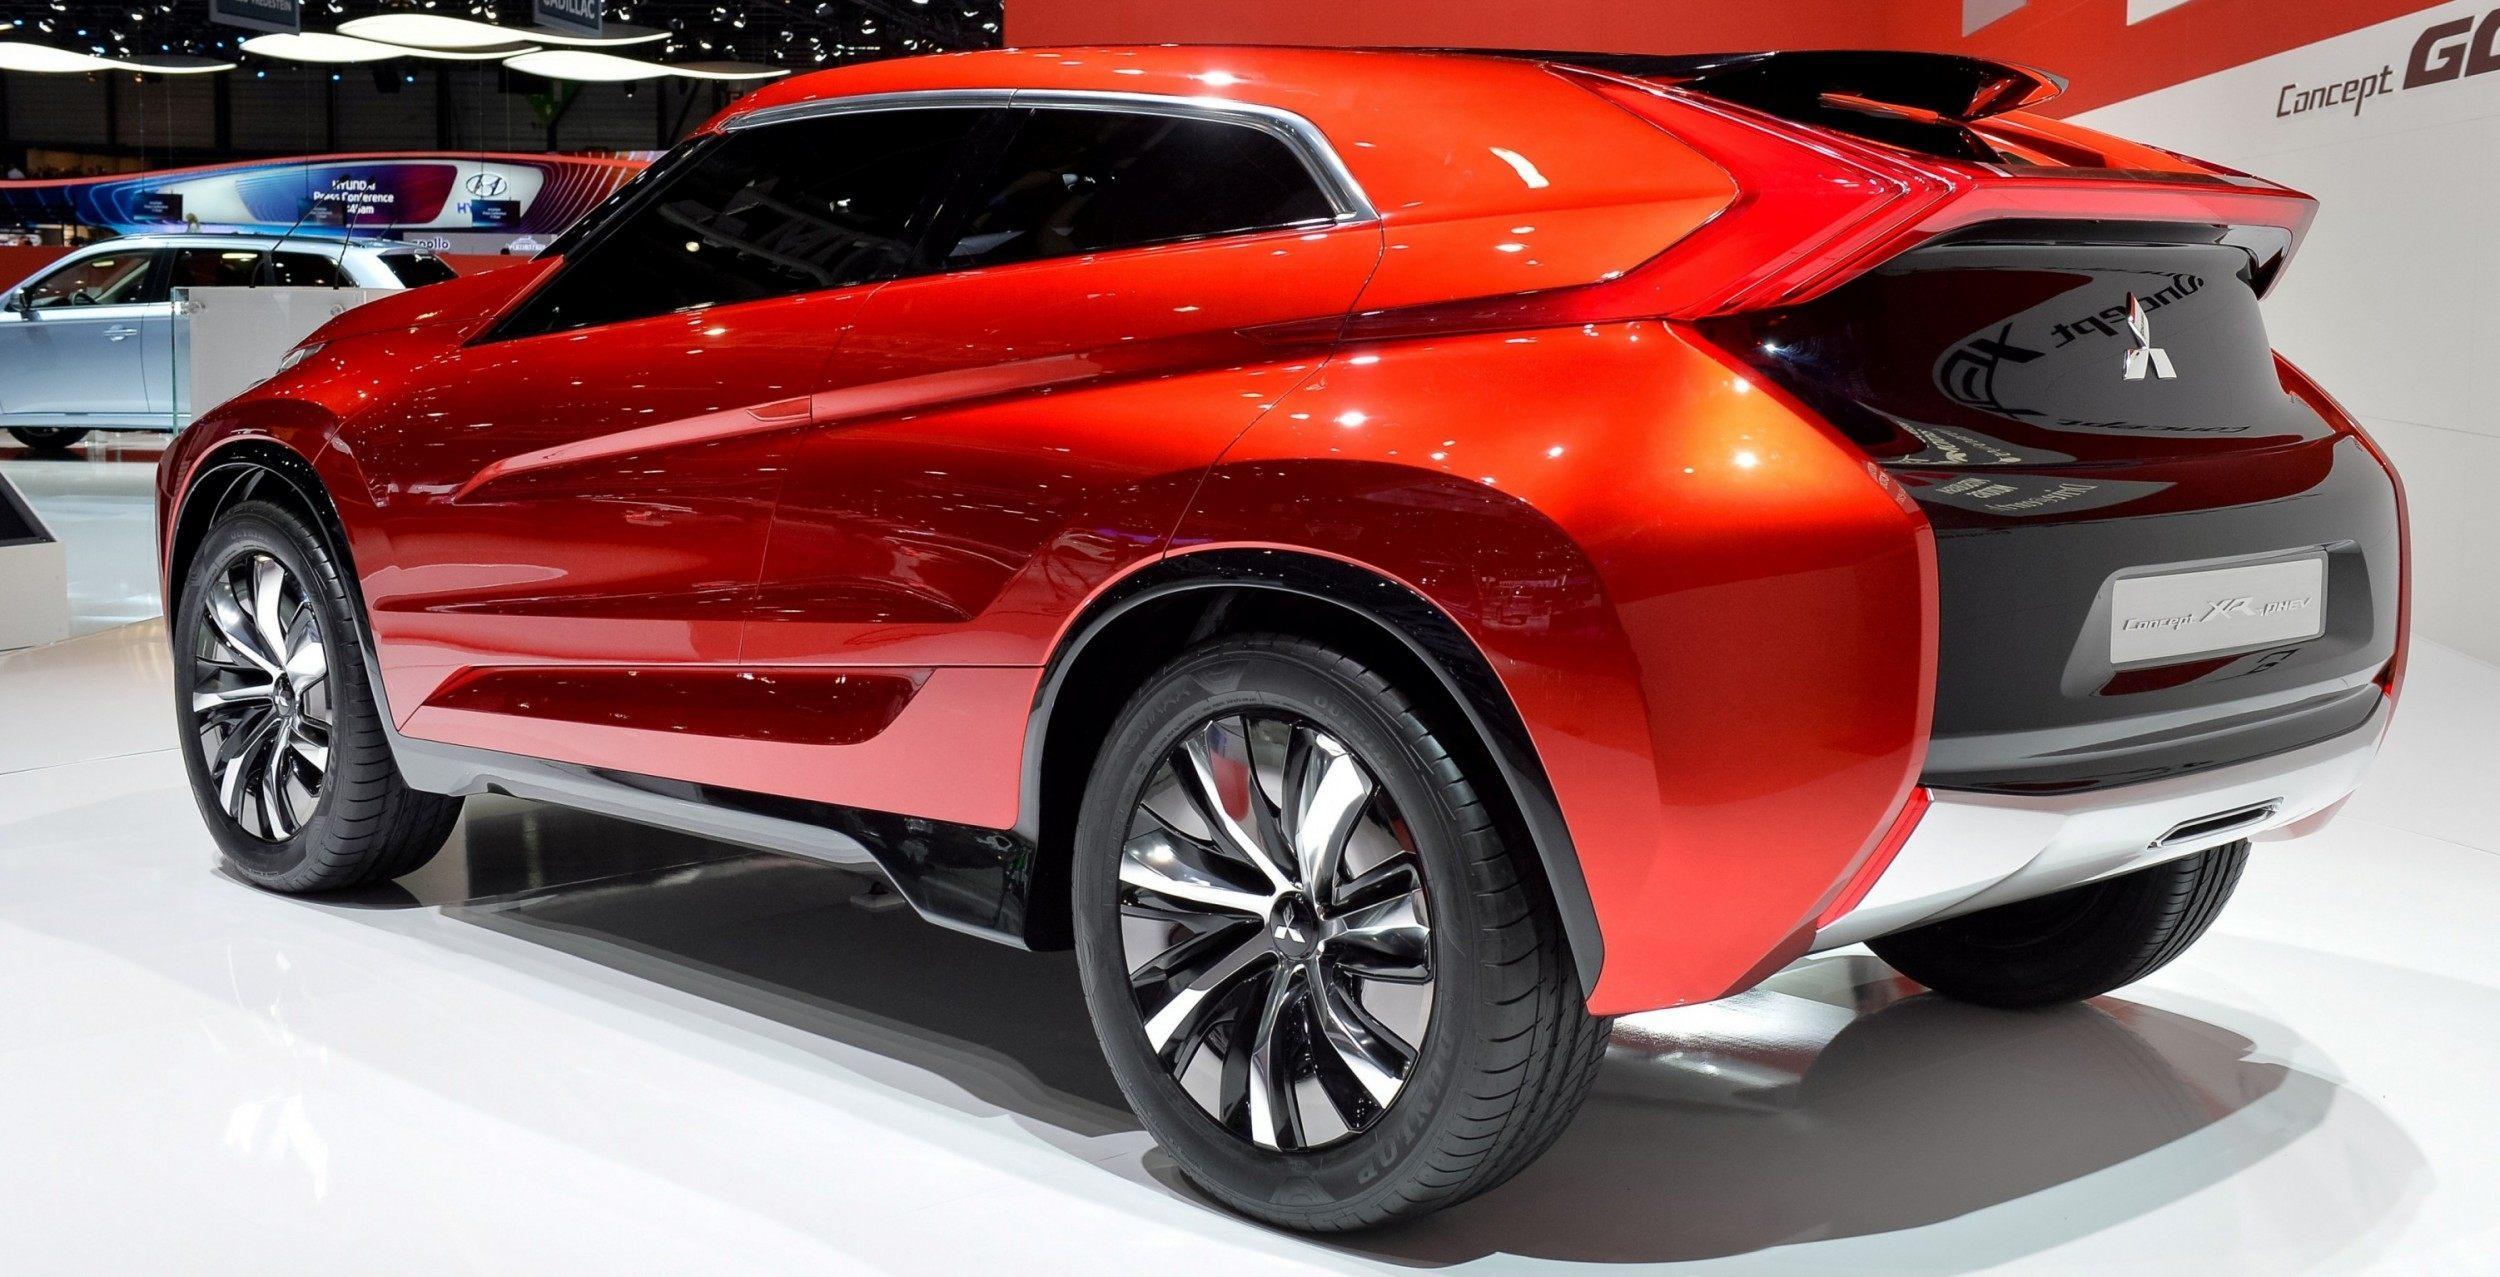 Vision GranTurismo Scores a Super Evo! Mitsubishi Concept XR-PHEV is Super Widetrack Racer 1